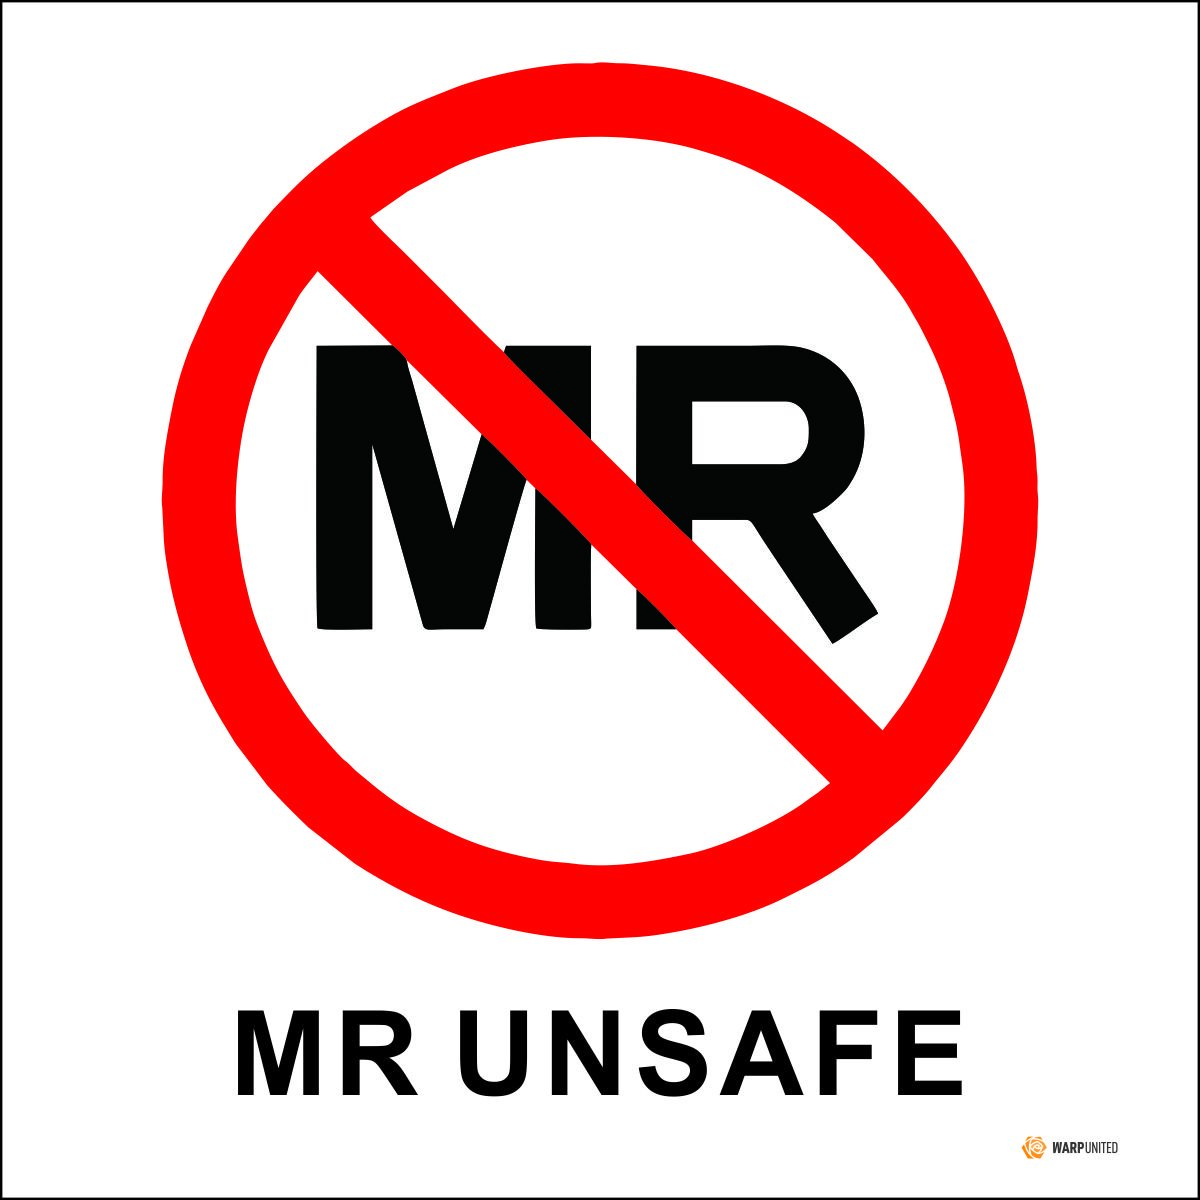 10-Pack MR UNSAFE Label MRI Unsafe Vinyl Sticker for Radiology 2 x 2 inch Waterproof Disinfectable IEC 62570:2014//ASTM F2503 Compliant Warp United MRTZ-02